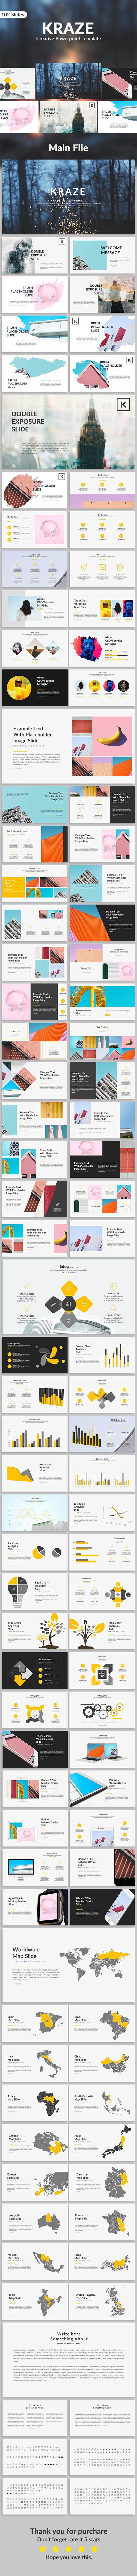 Kraze - Creative Google Slide Template - Google Slides Presentation Templates